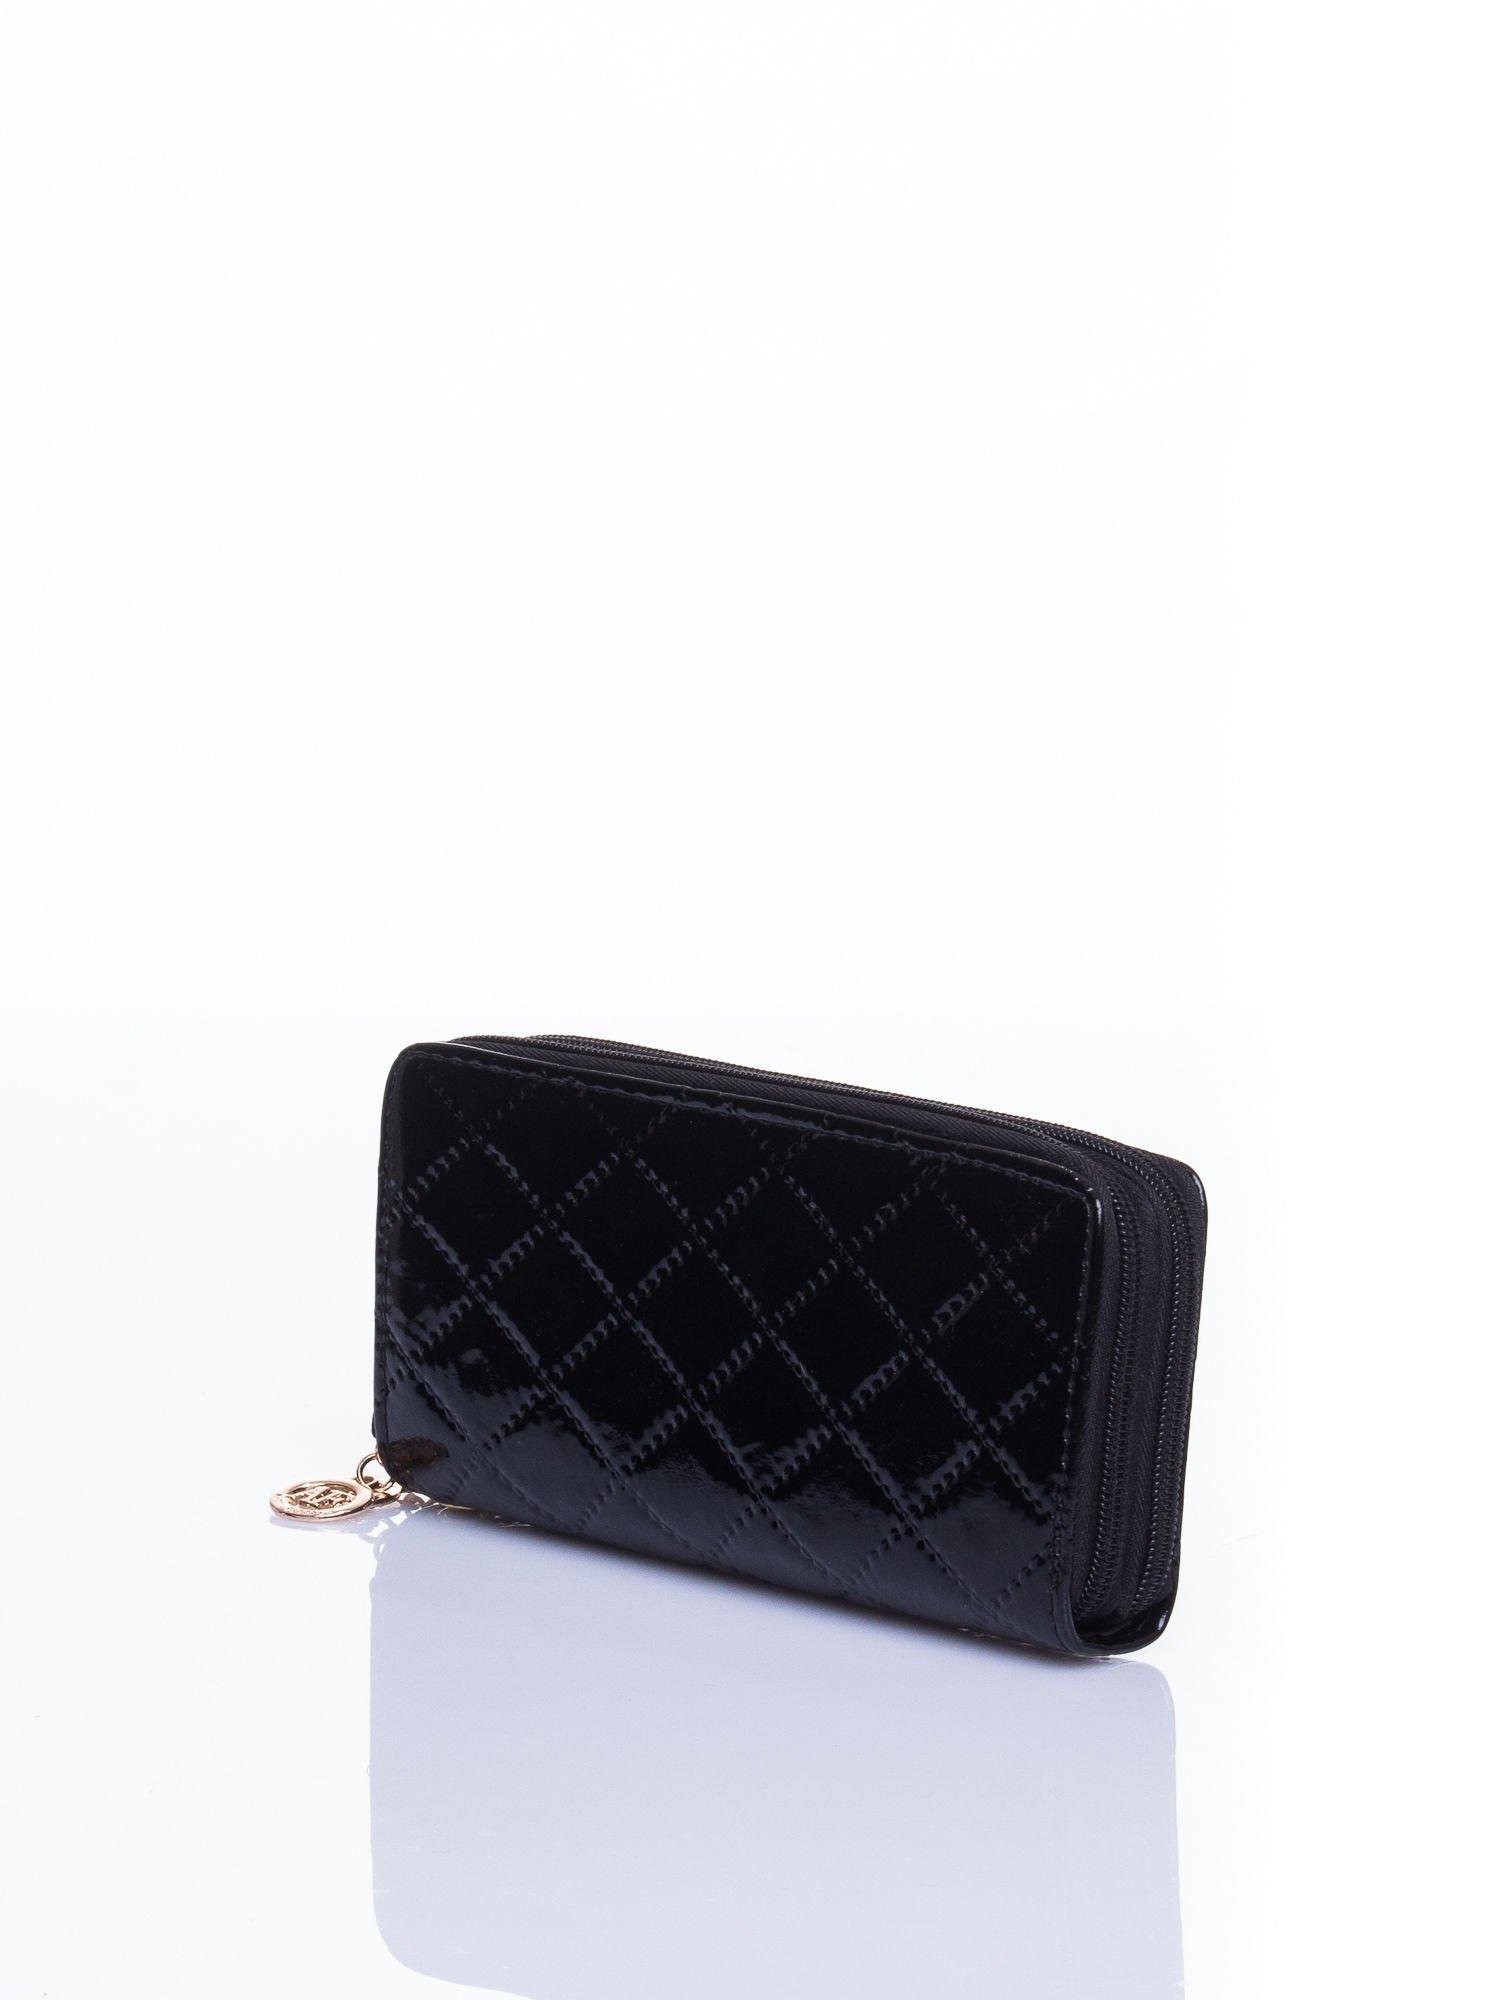 Czarny lakierowany pikowany portfel                                  zdj.                                  2